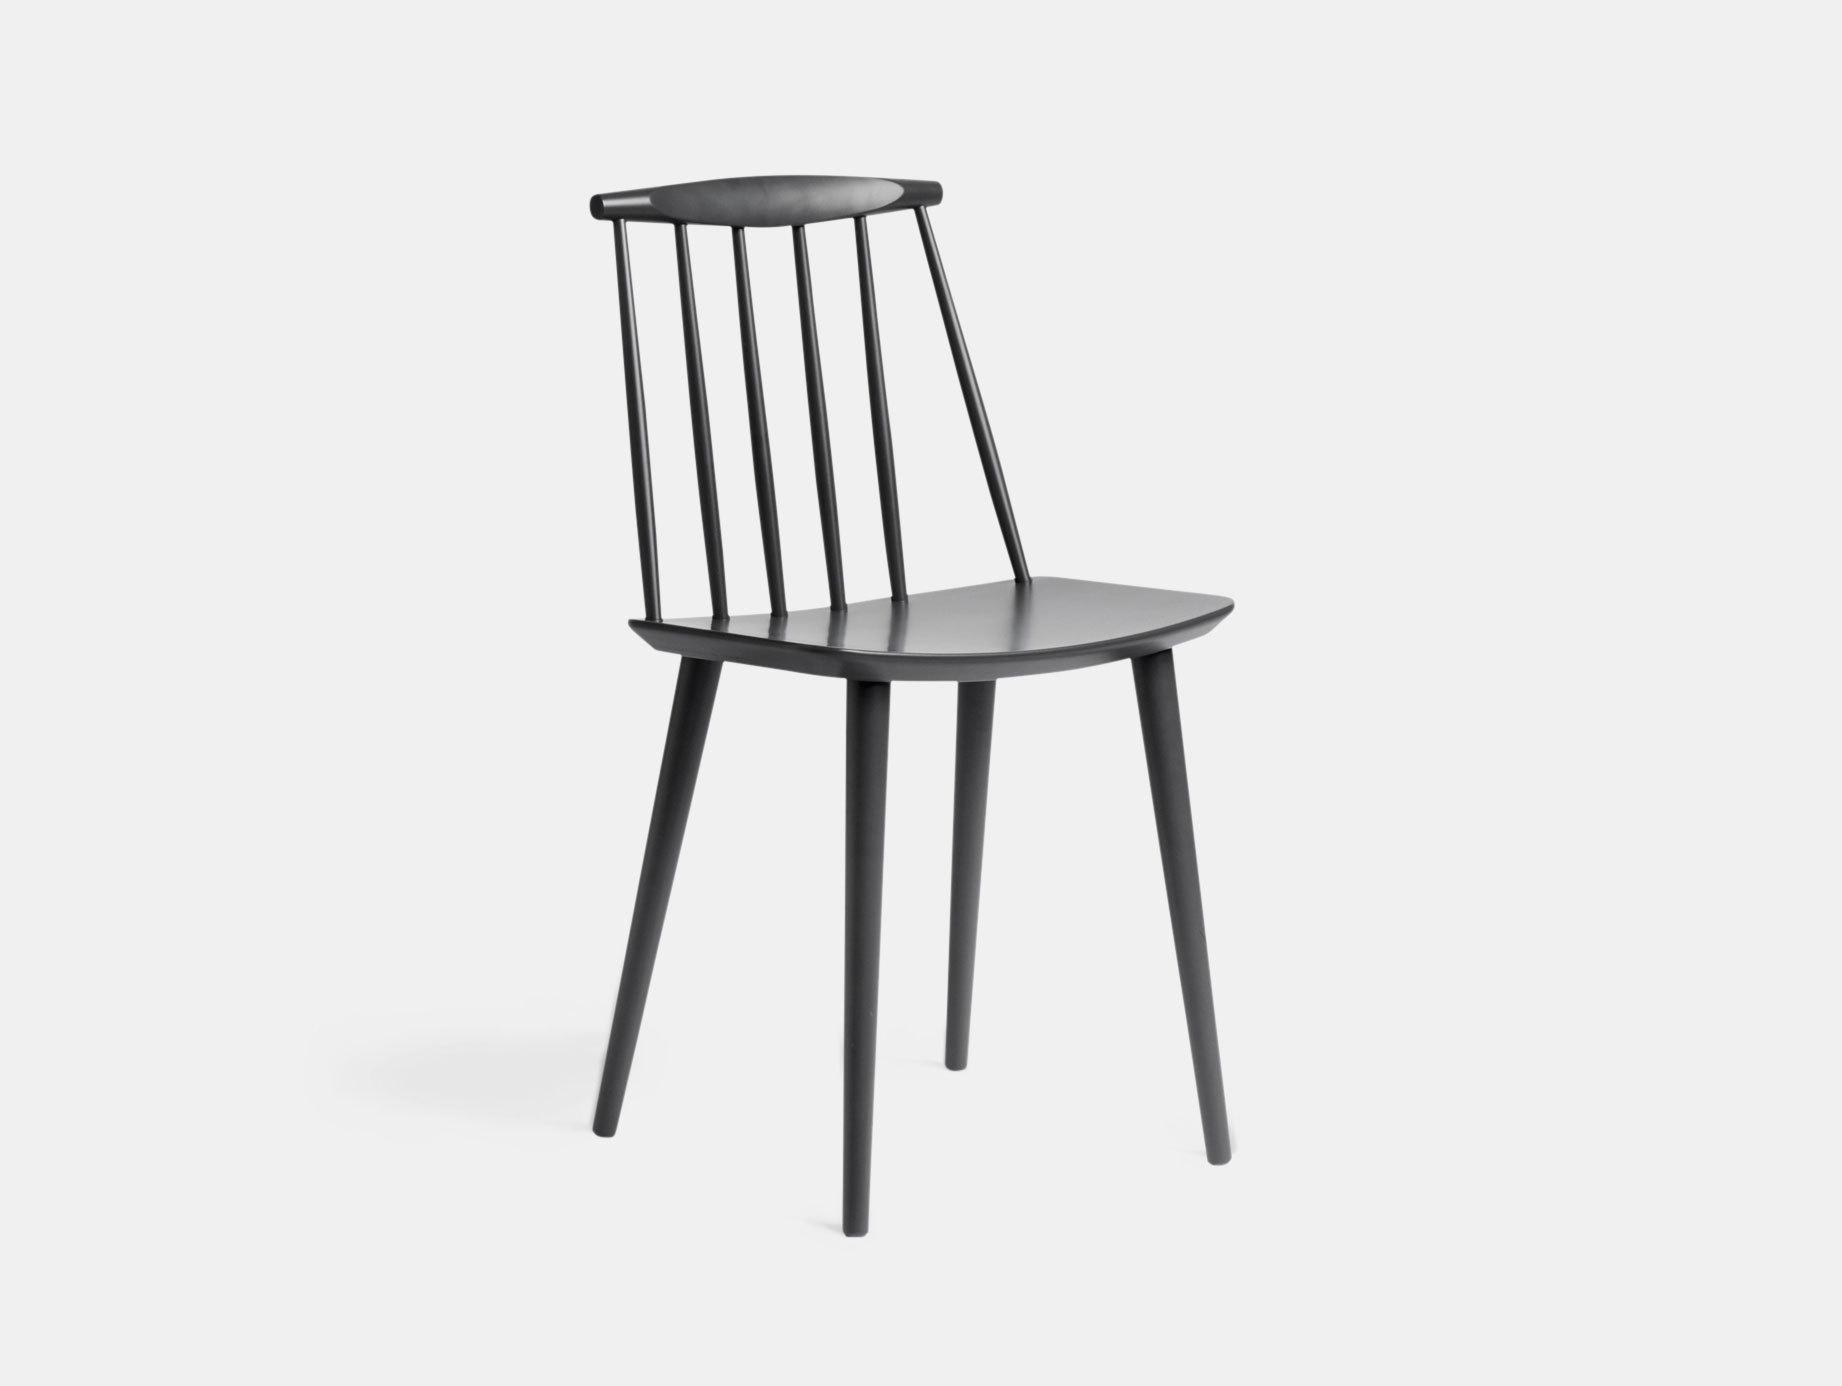 J77 Chair image 2